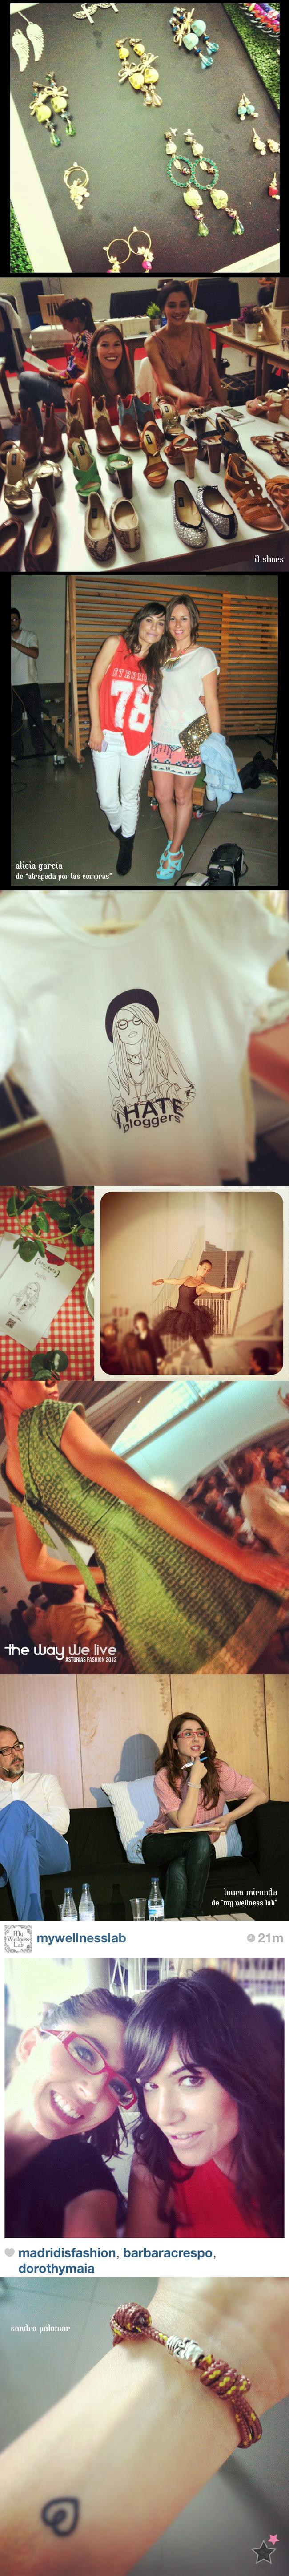 the way we live. asturias fashion 2012